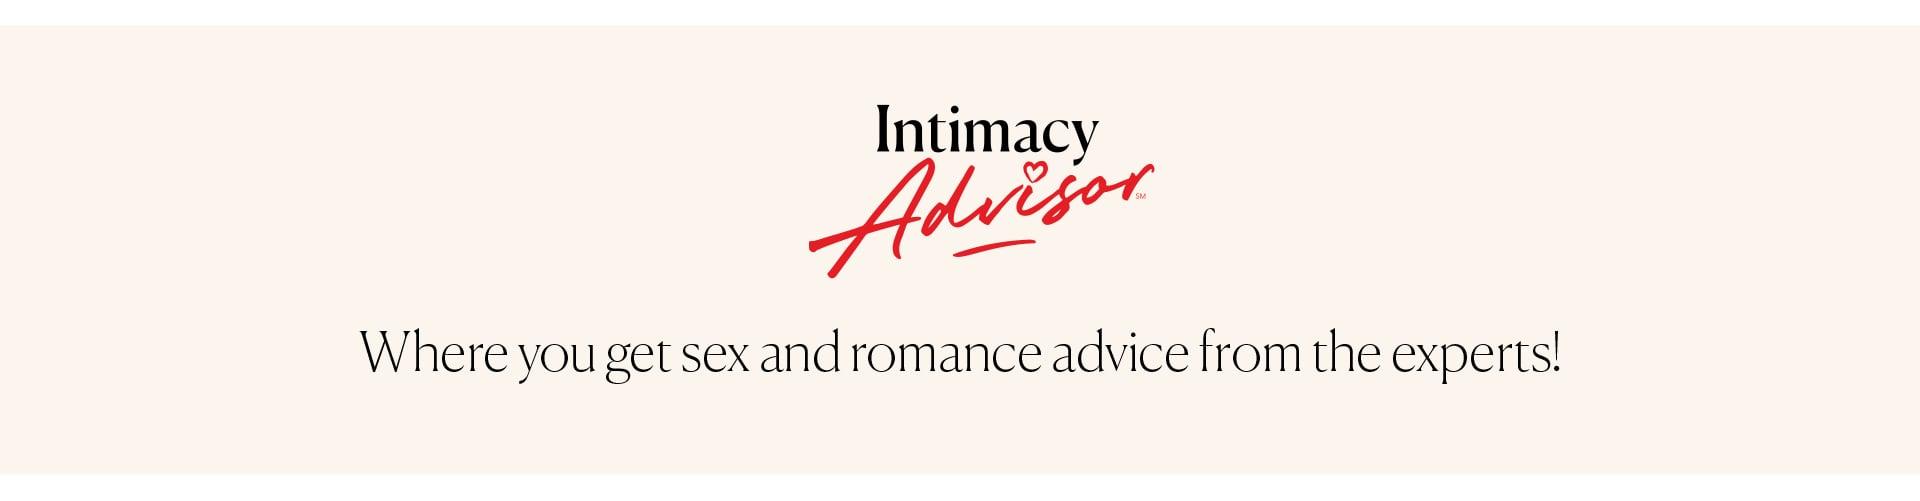 Intimacy Advisor